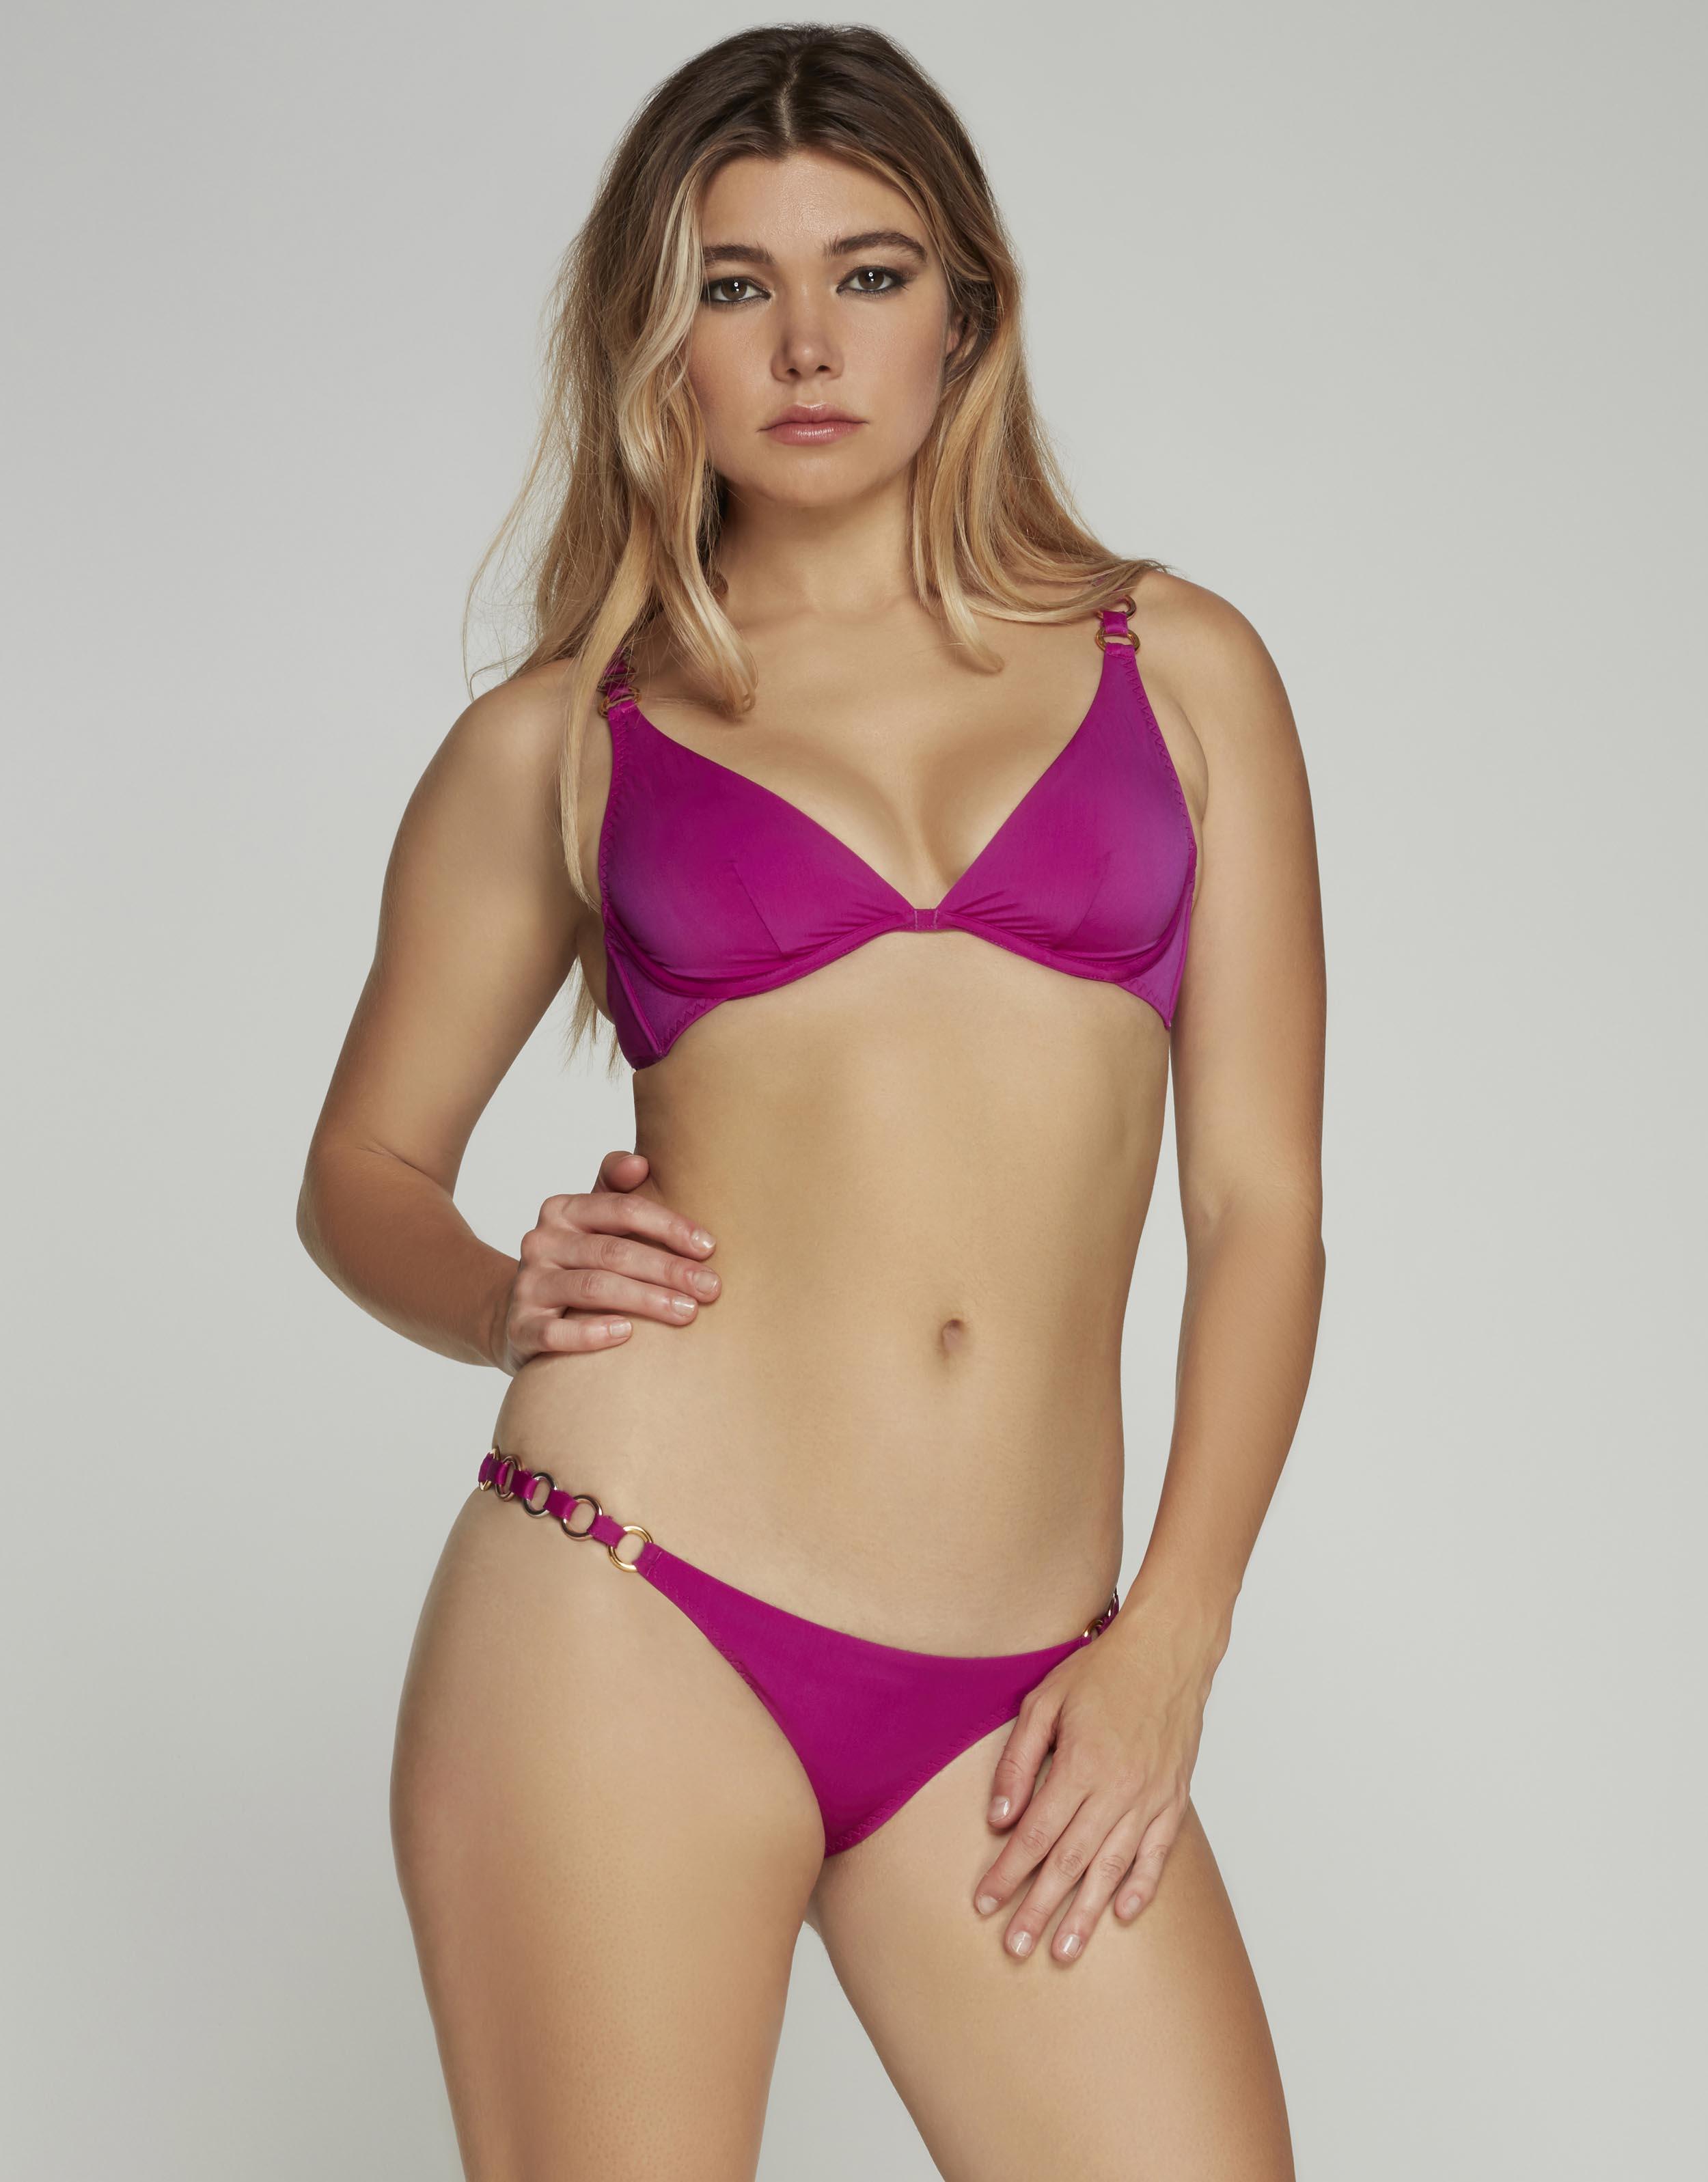 Agent Provocateur Kayla Bikini Bra In Pink